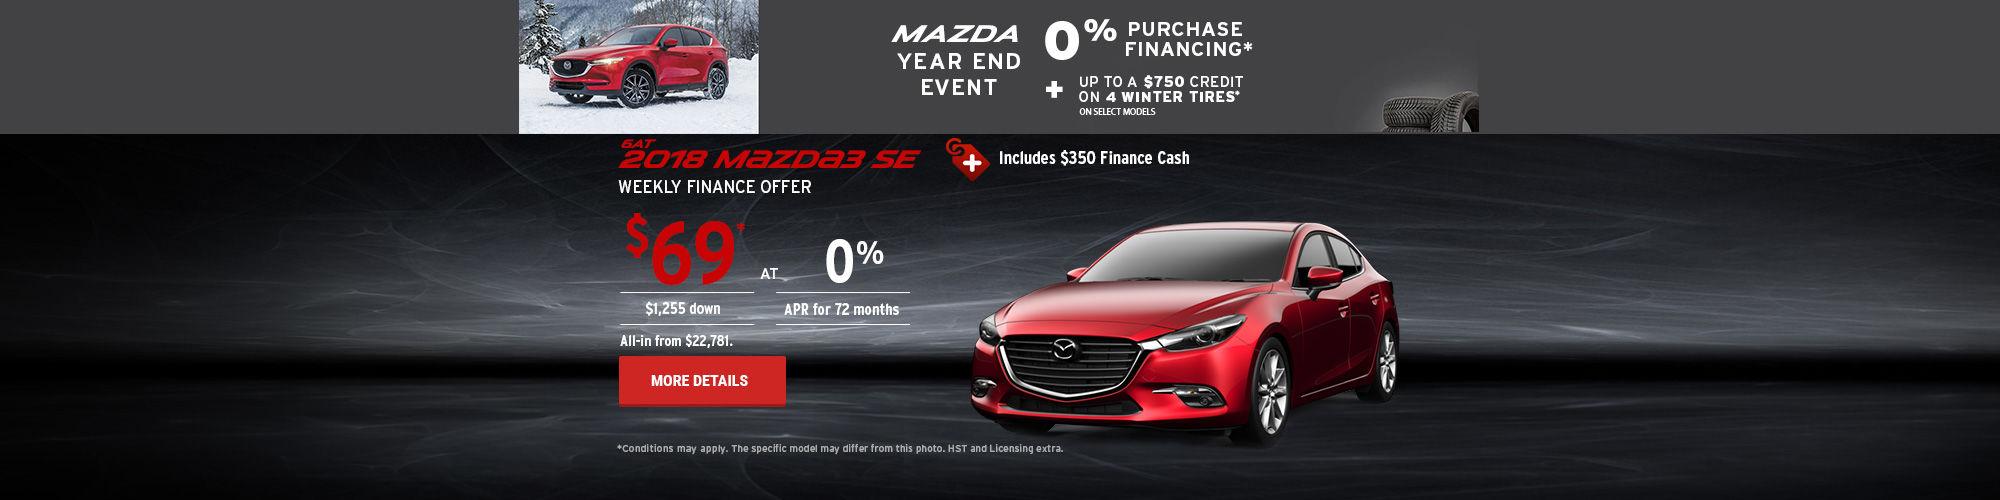 2018 Mazda3 - header